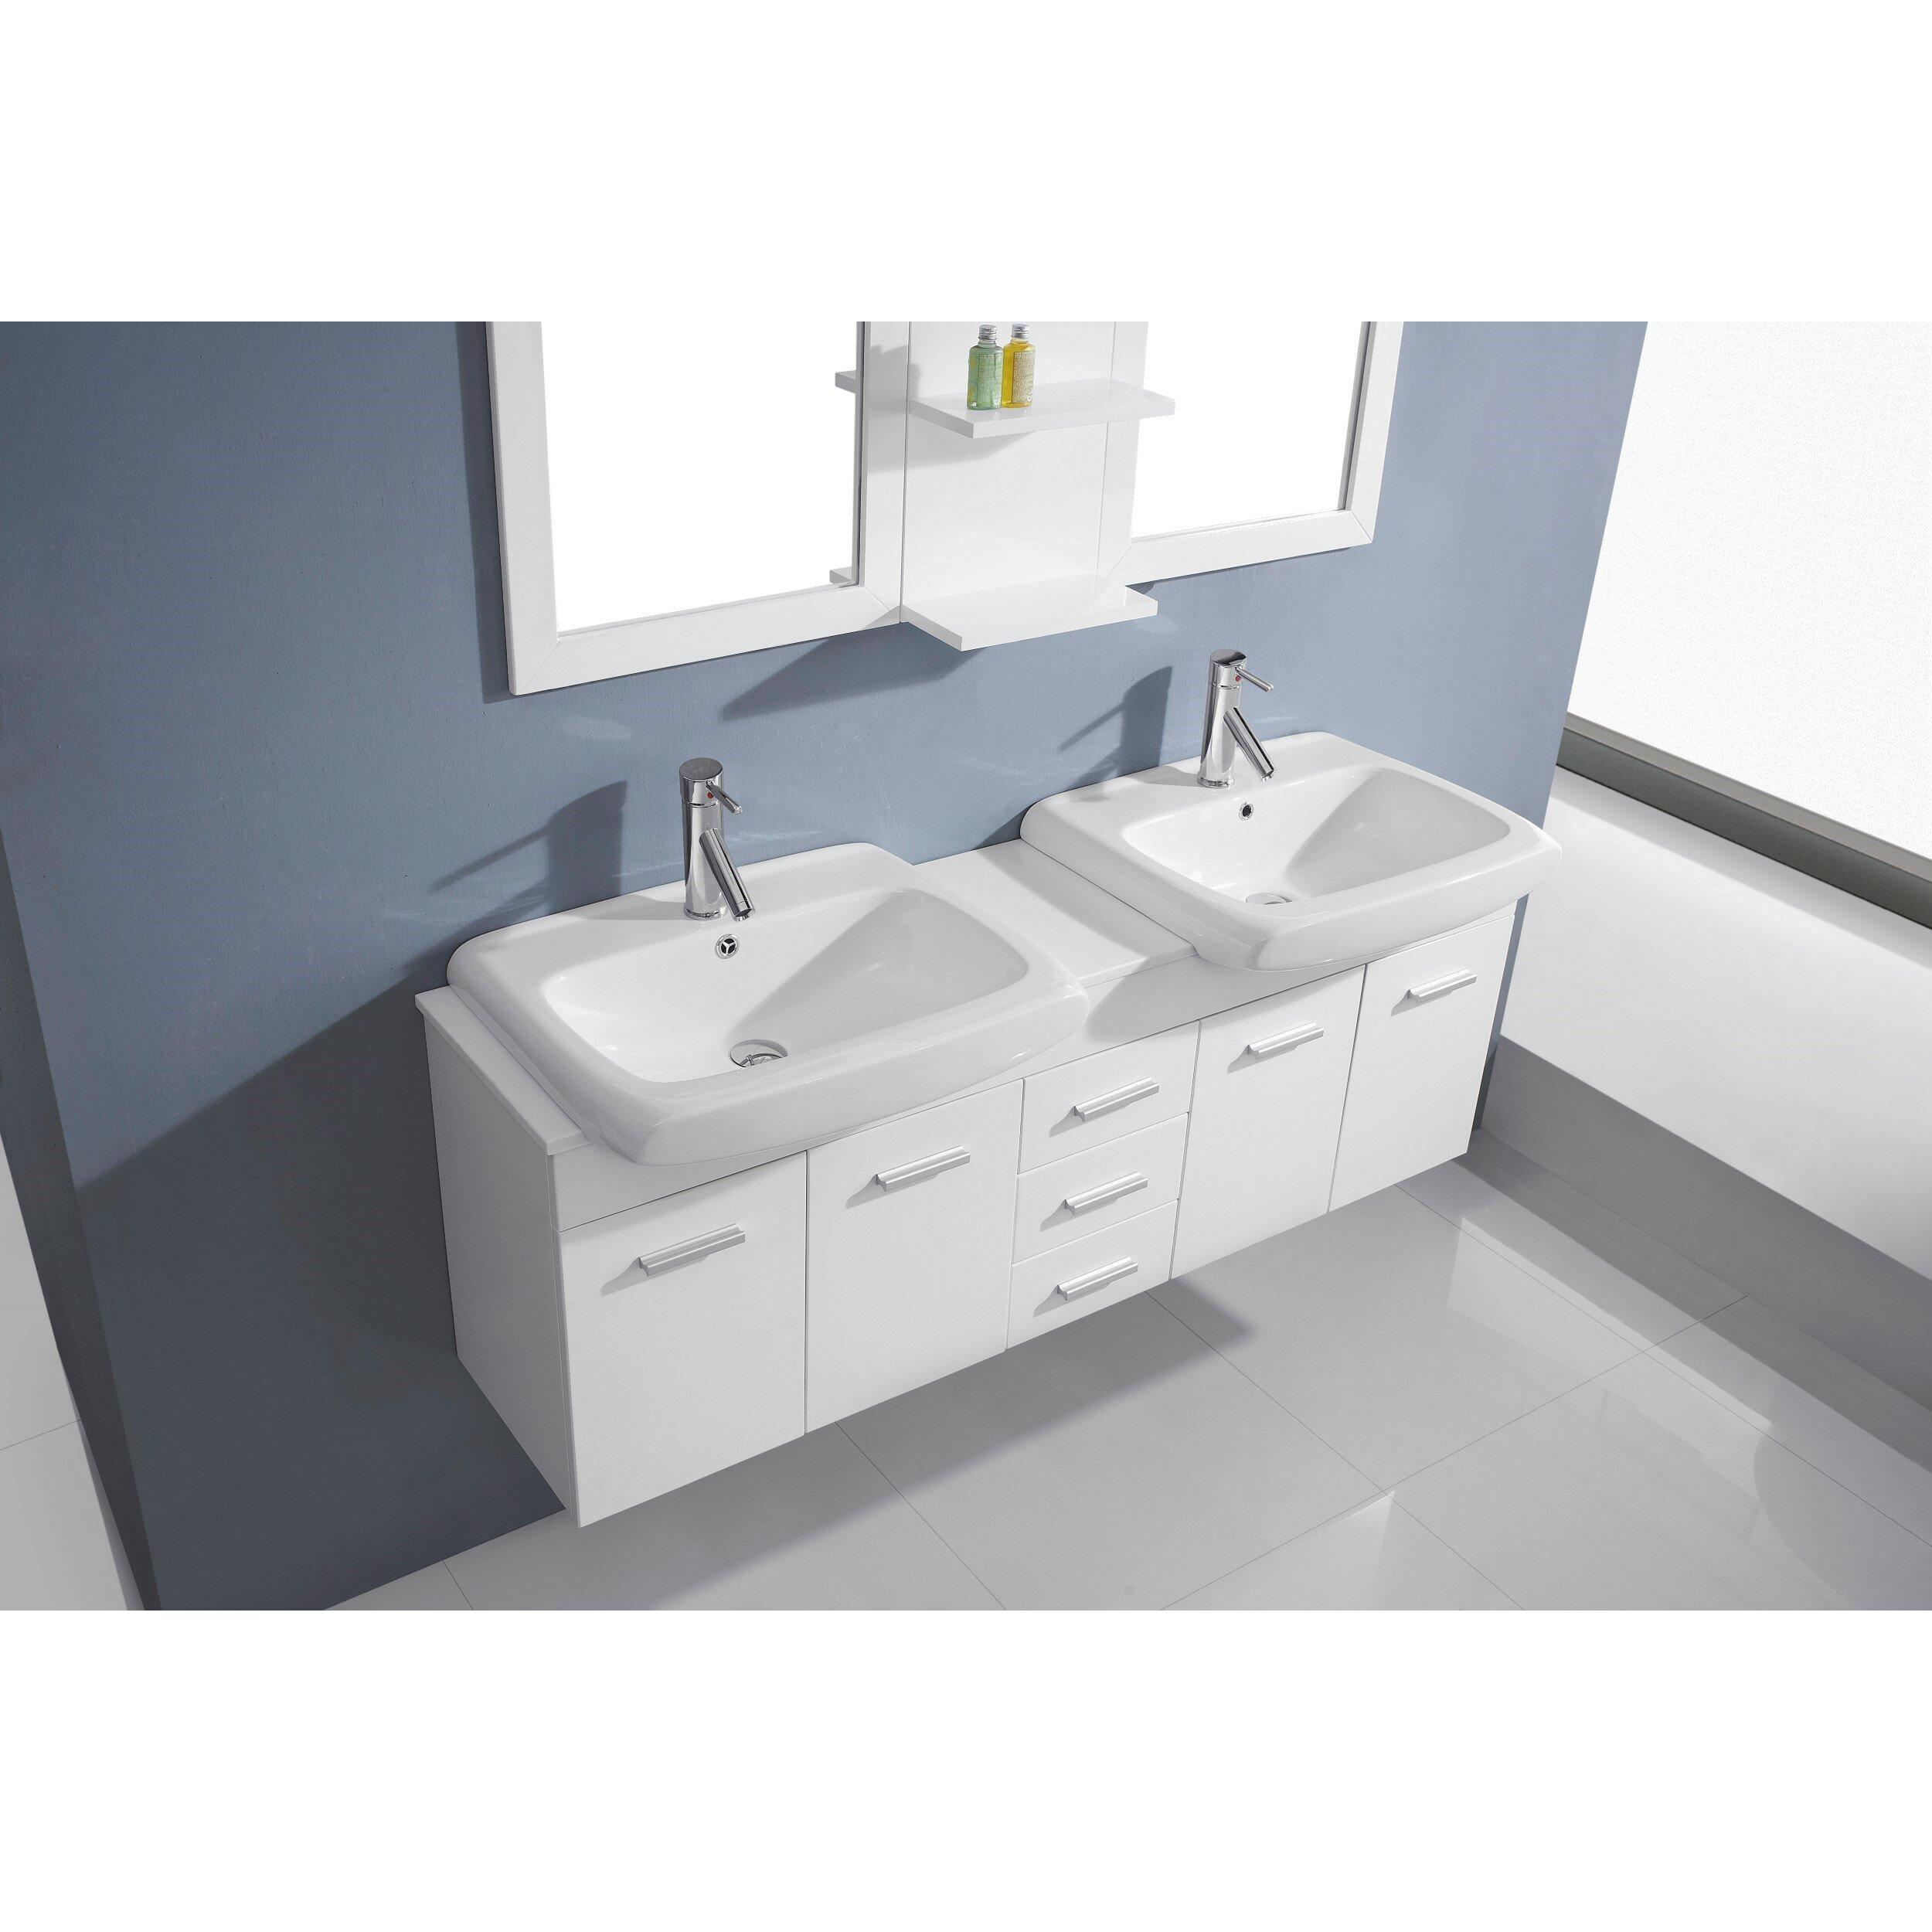 Virtu ultra modern series 59 double bathroom vanity set with white stone top and mirror for Ultra bathroom vanities burbank